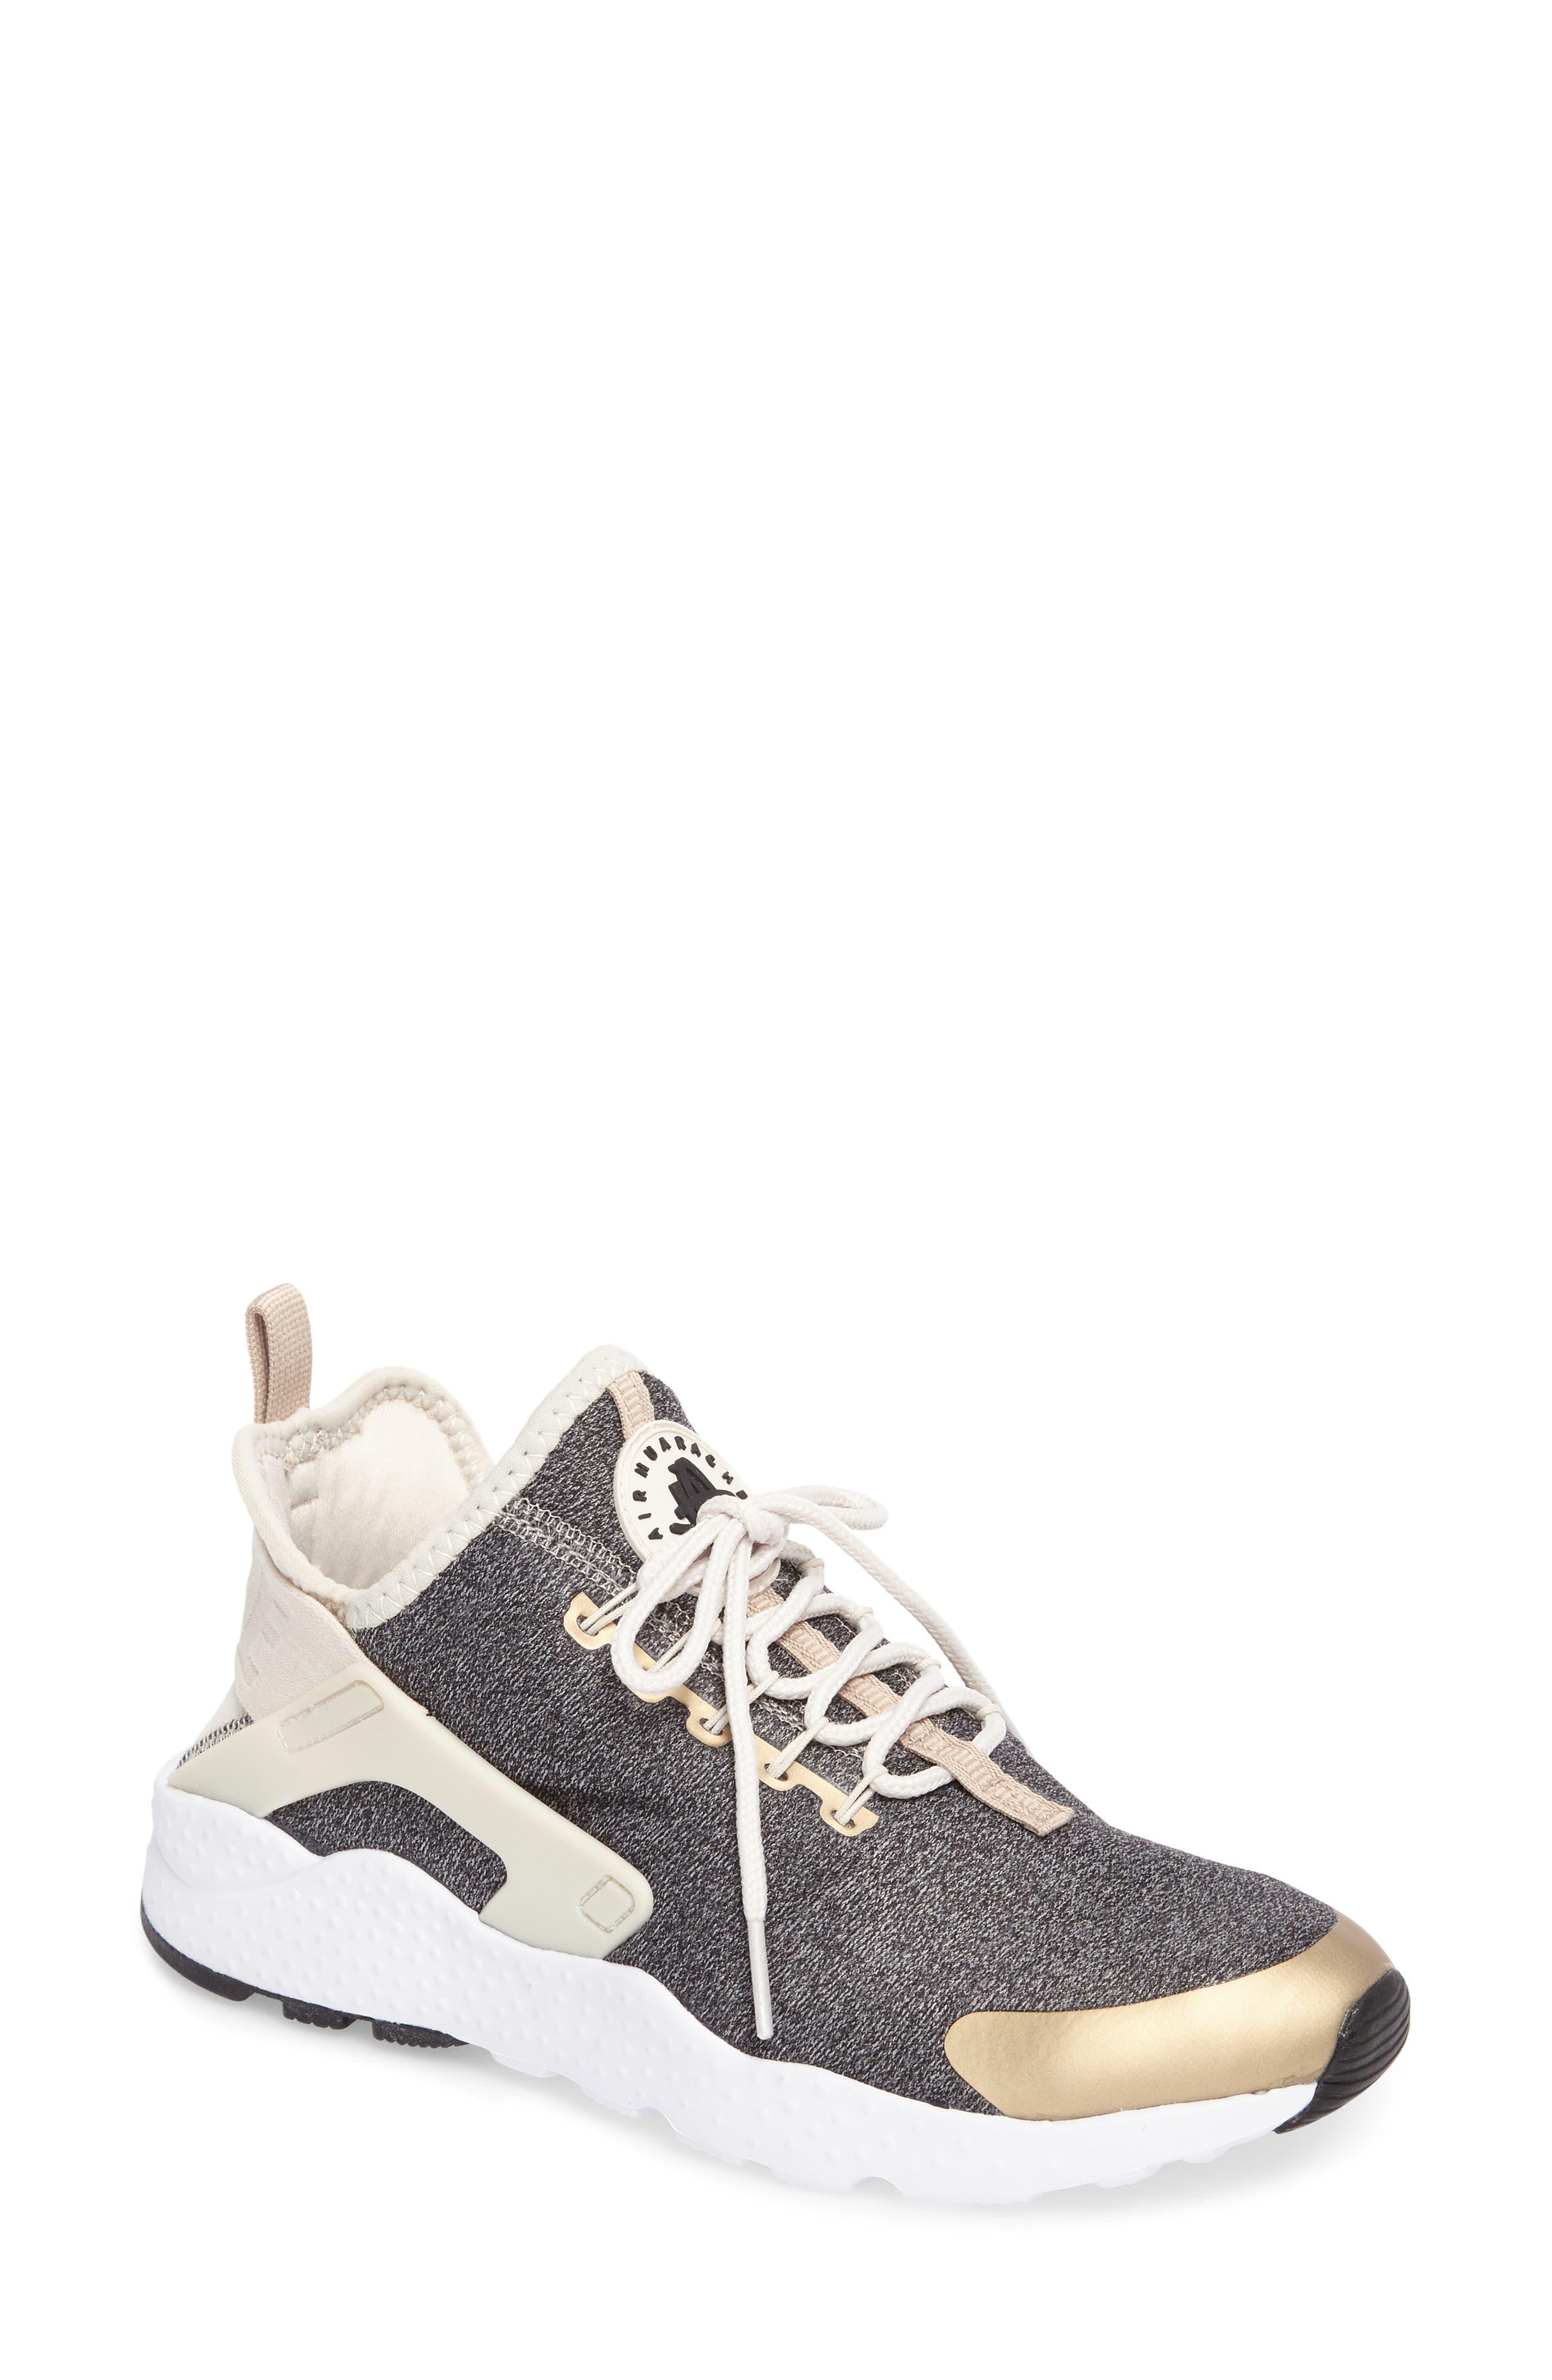 NIKE 'Air Huarache Run Ultra SE' Sneaker, Main, color, 285